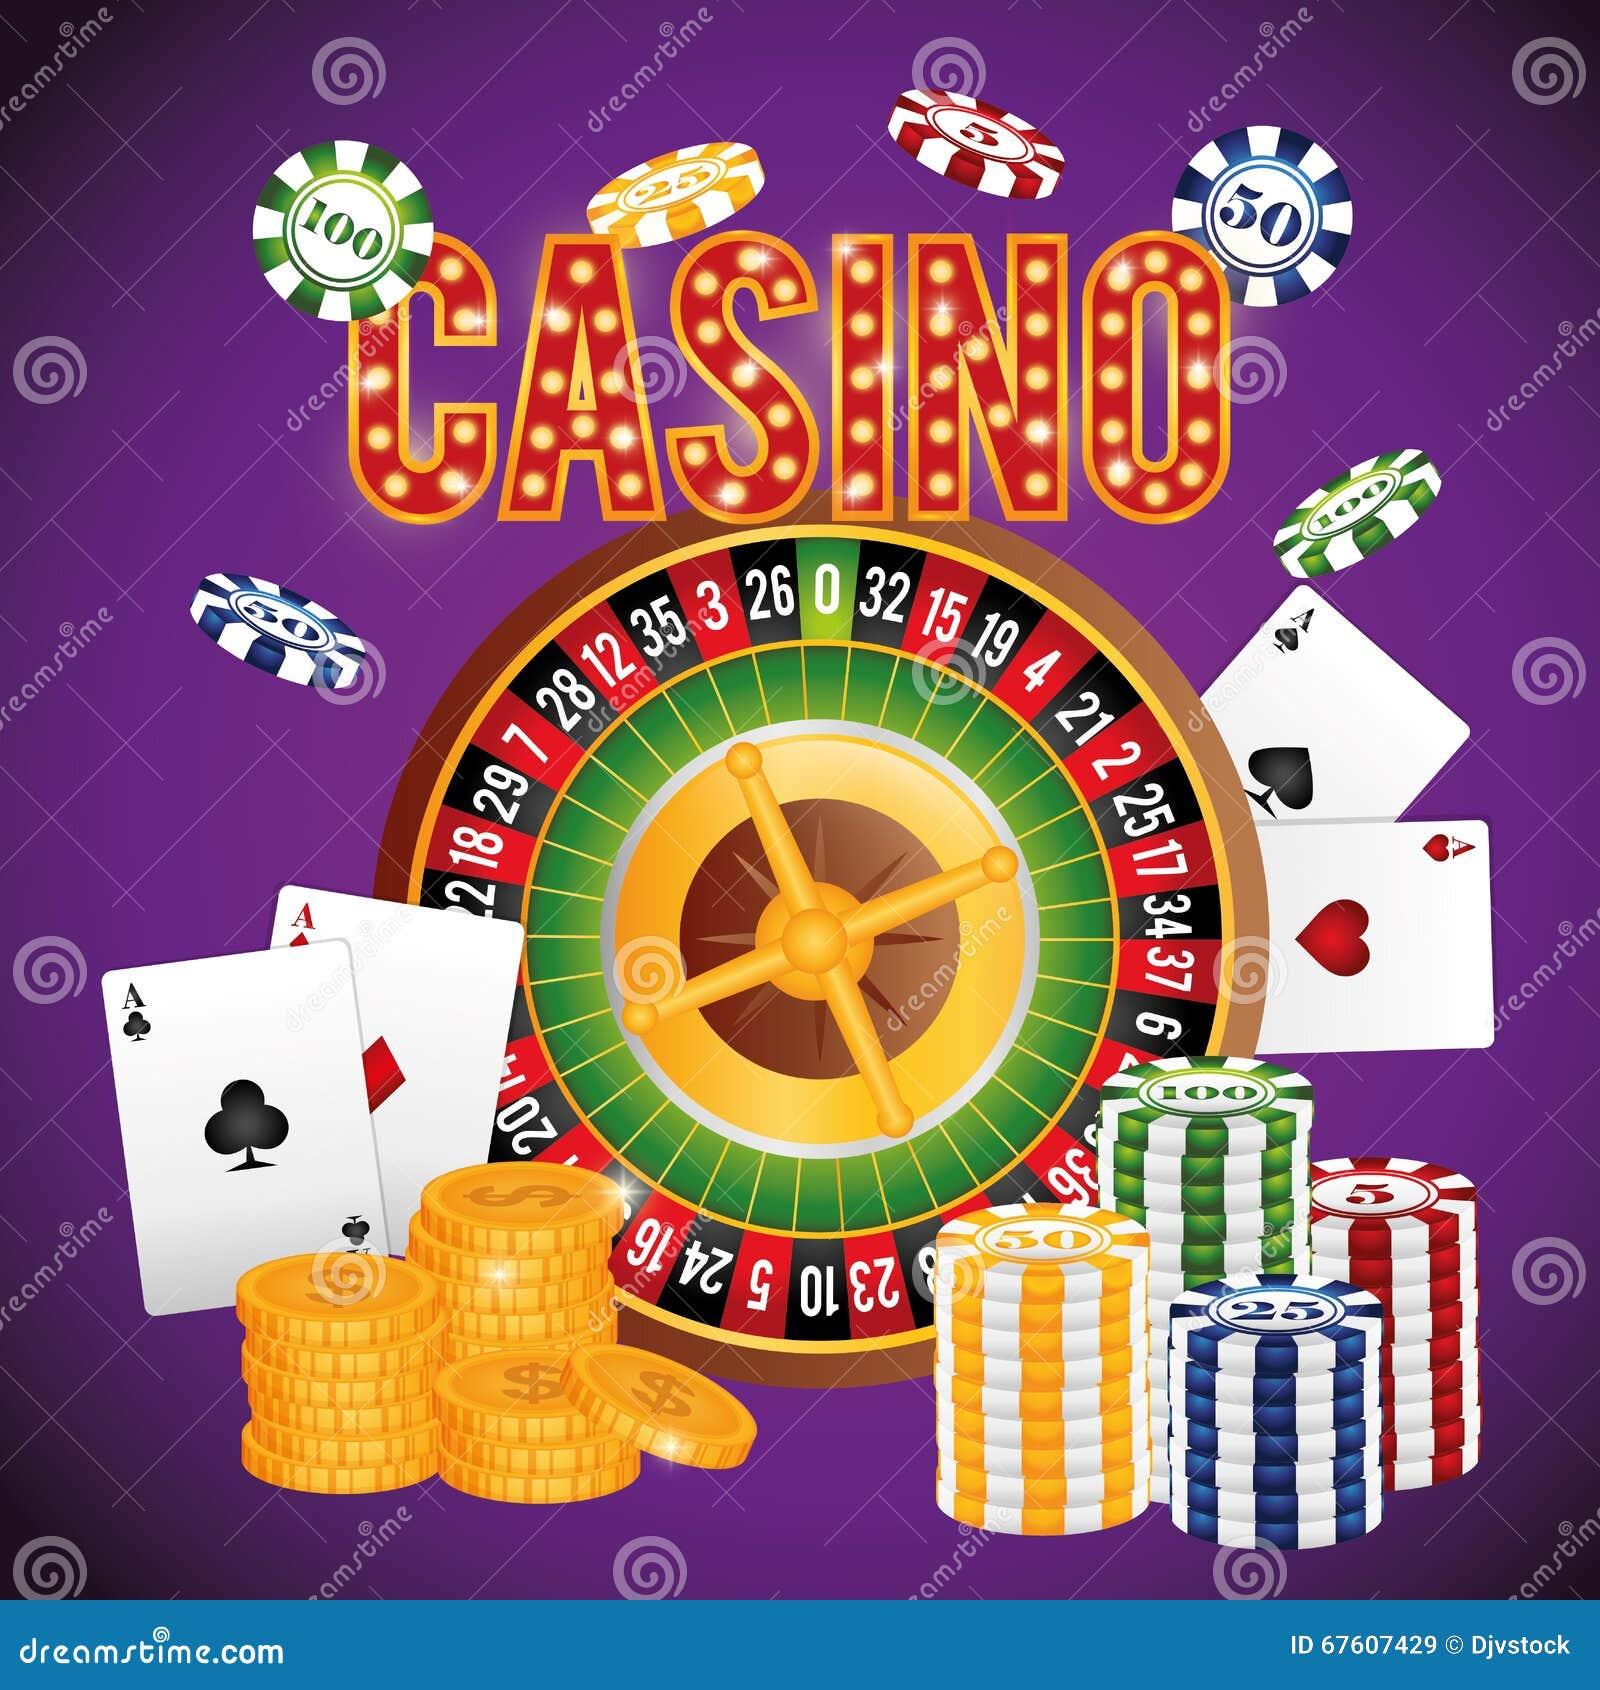 Casino icon desin stock vector image 67607429 for Architectural design concepts las vegas